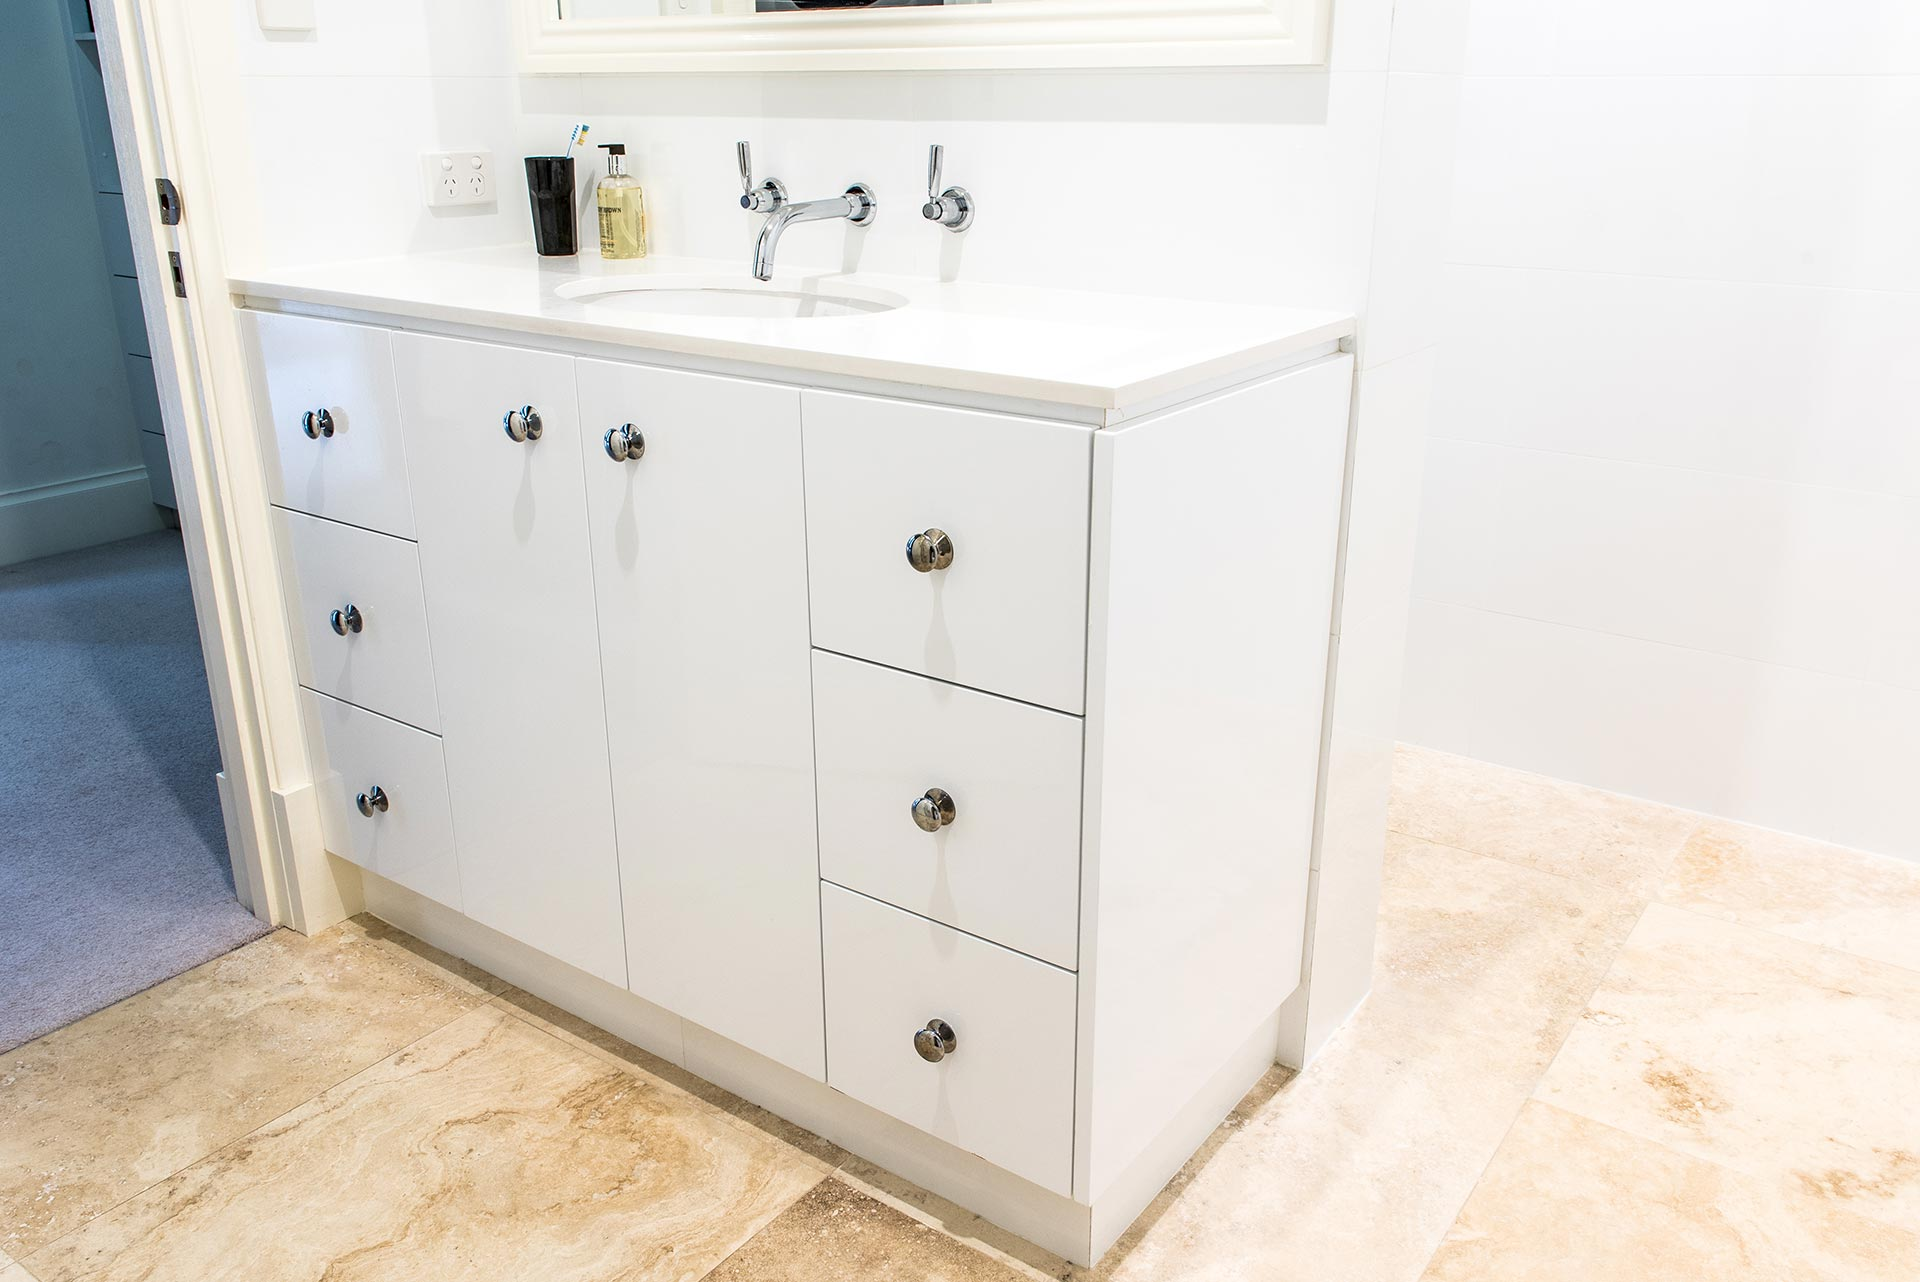 Credenza Perth Wa : Bathroom renovations quality renovators in perth best design & ideas